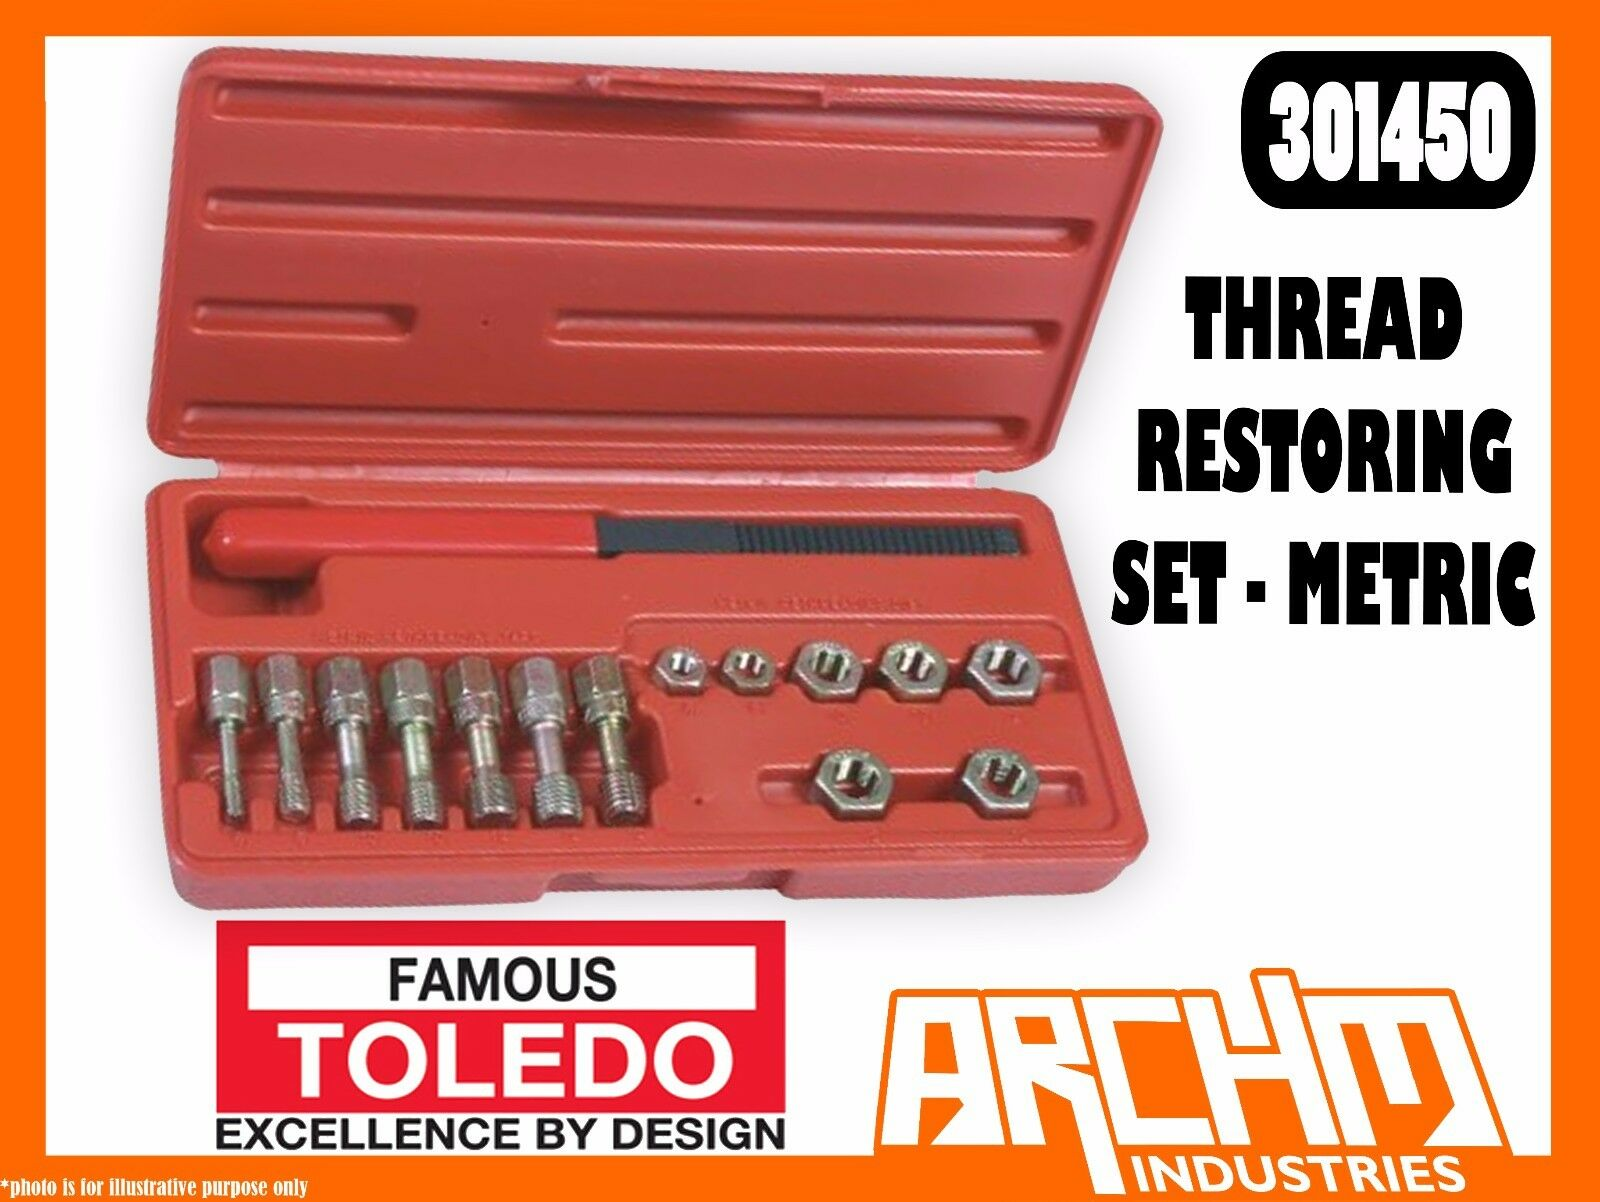 TOLEDO 301450 - THREAD RESTORING SET - METRIC - DAMAGED WORN CORRODED